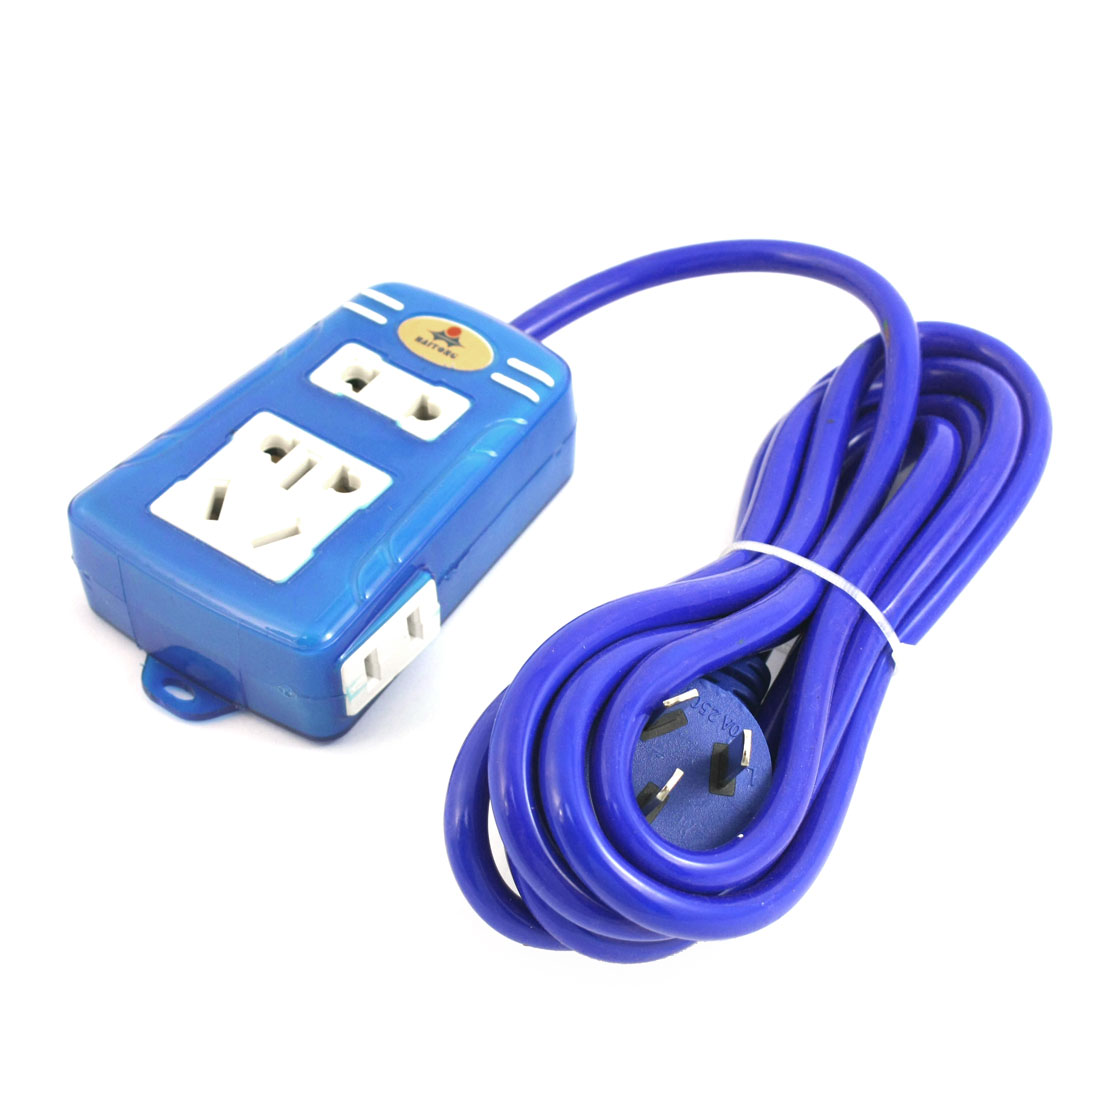 AU Plug AC 250V 16A 5 Way 5000W US EU AU Extension Socket Power Strip 3 Meter